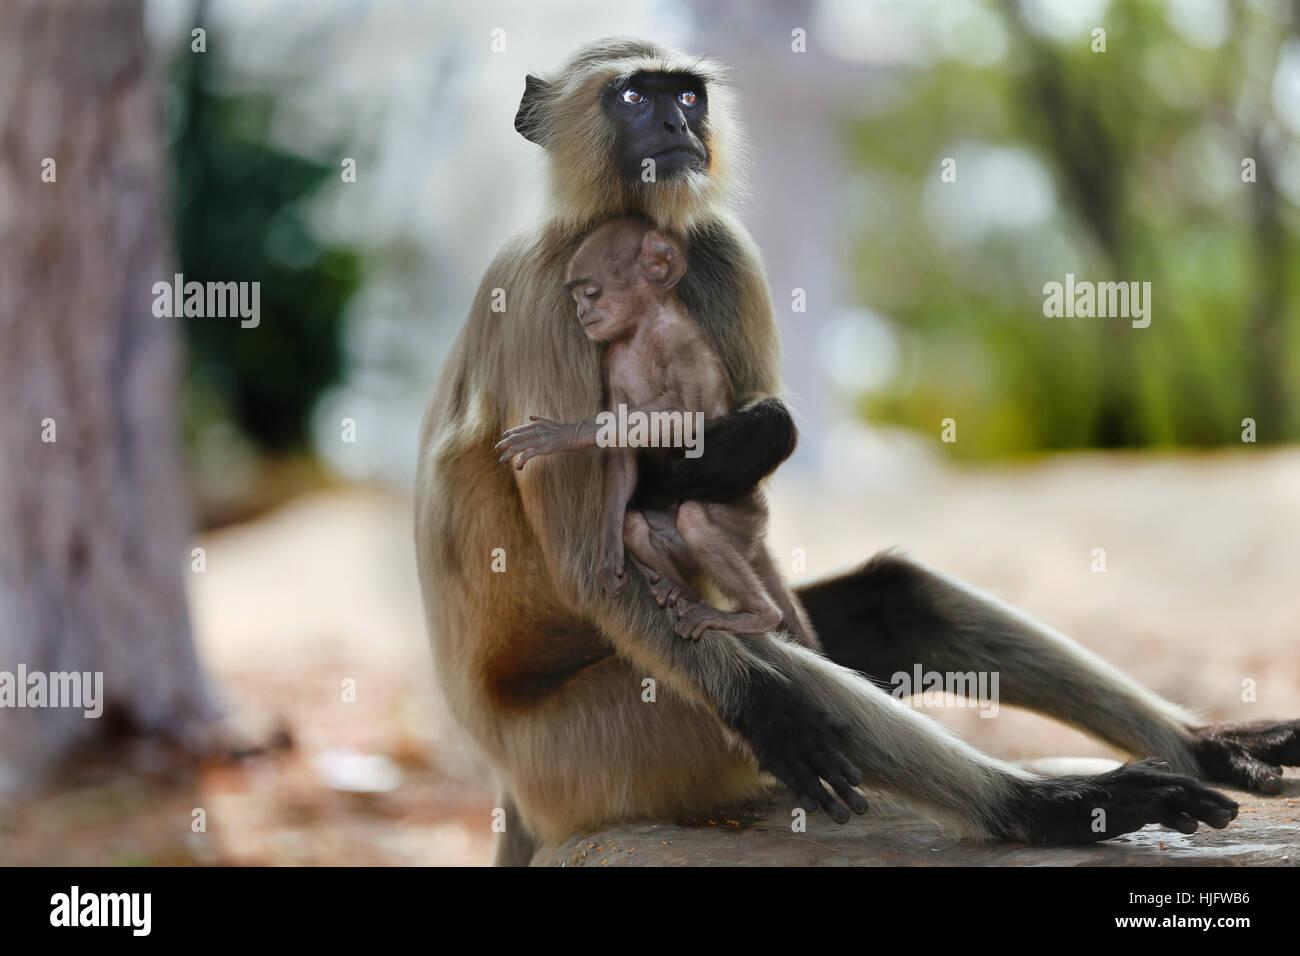 Animal tenderness - Stock Image